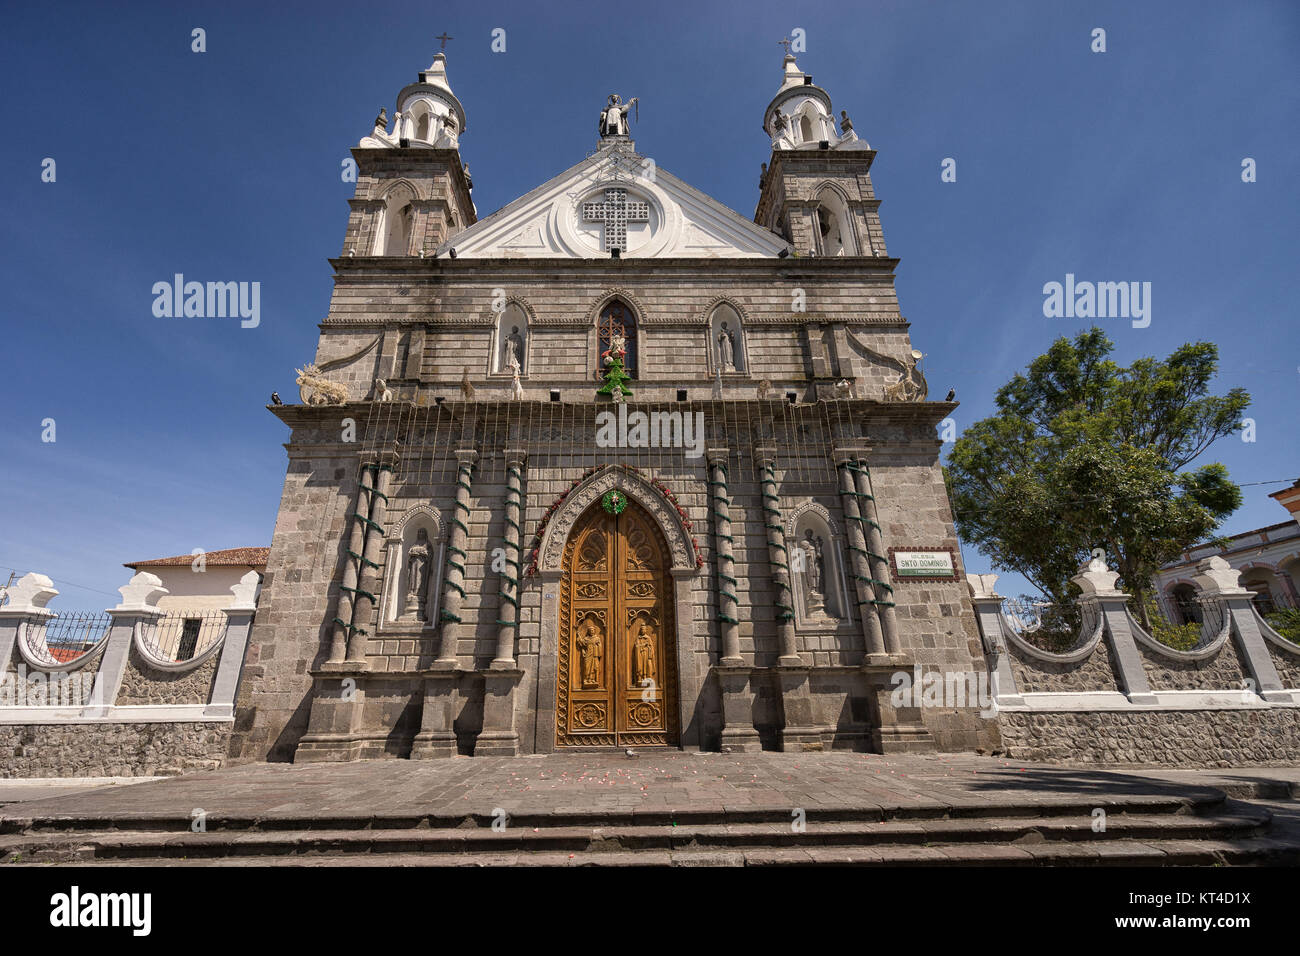 the Santo Domingo church in Ibarra historic center - Stock Image